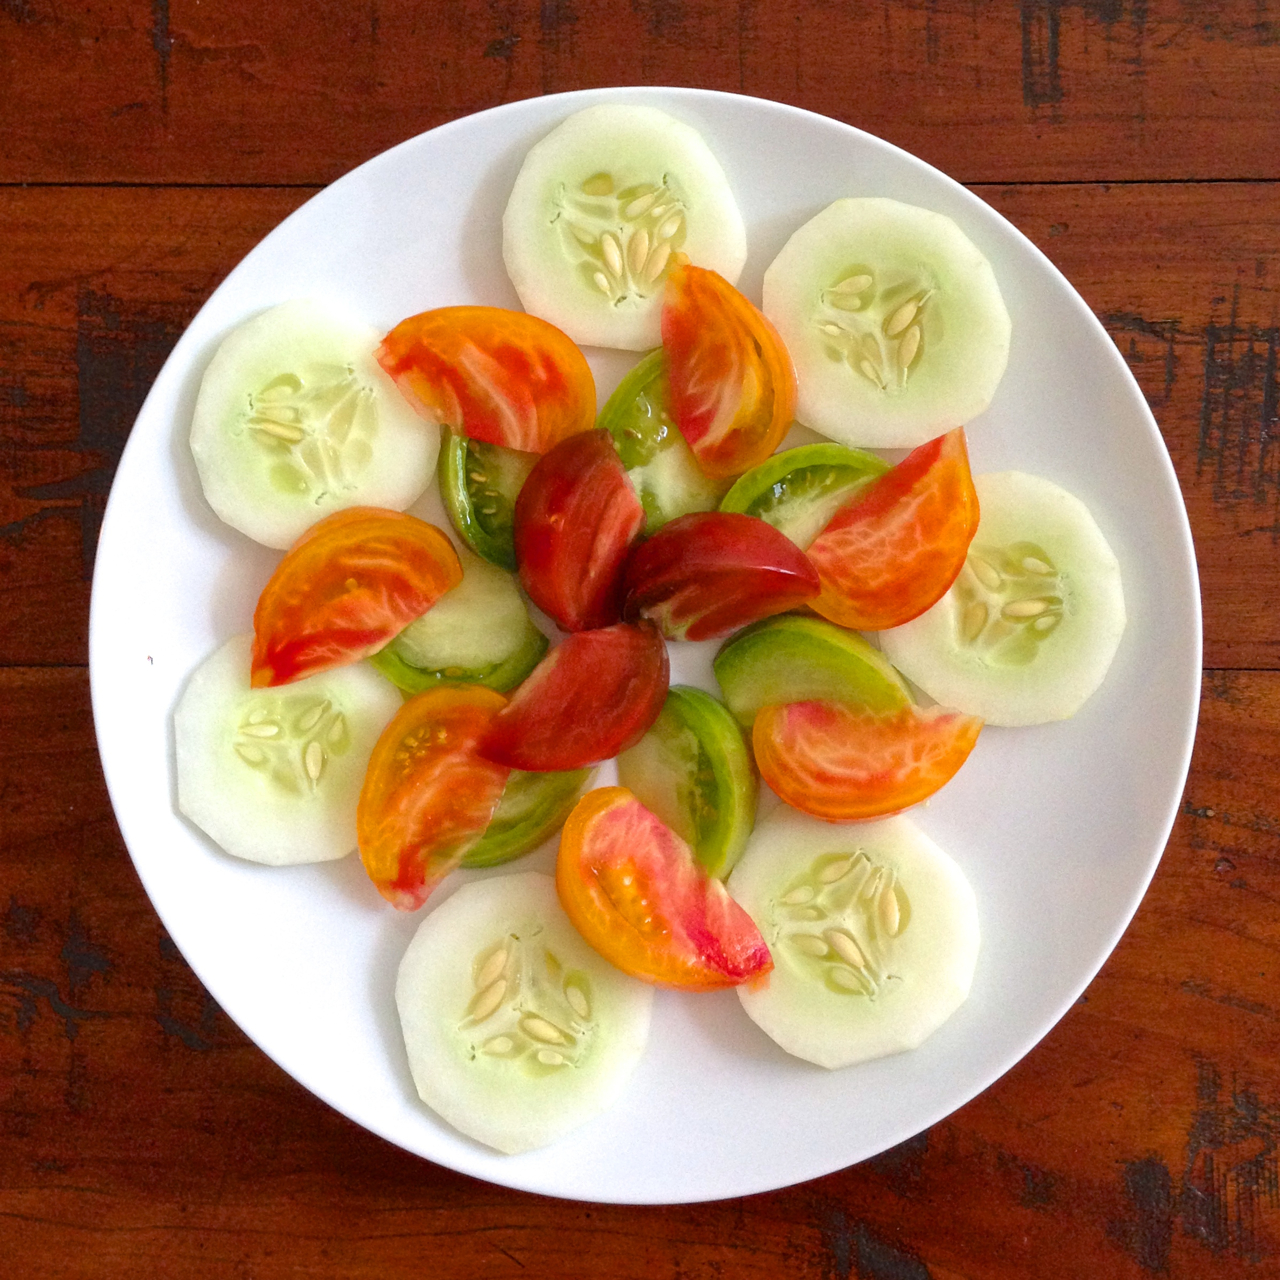 Sliced Cucumbers and Heirloom Tomatoes